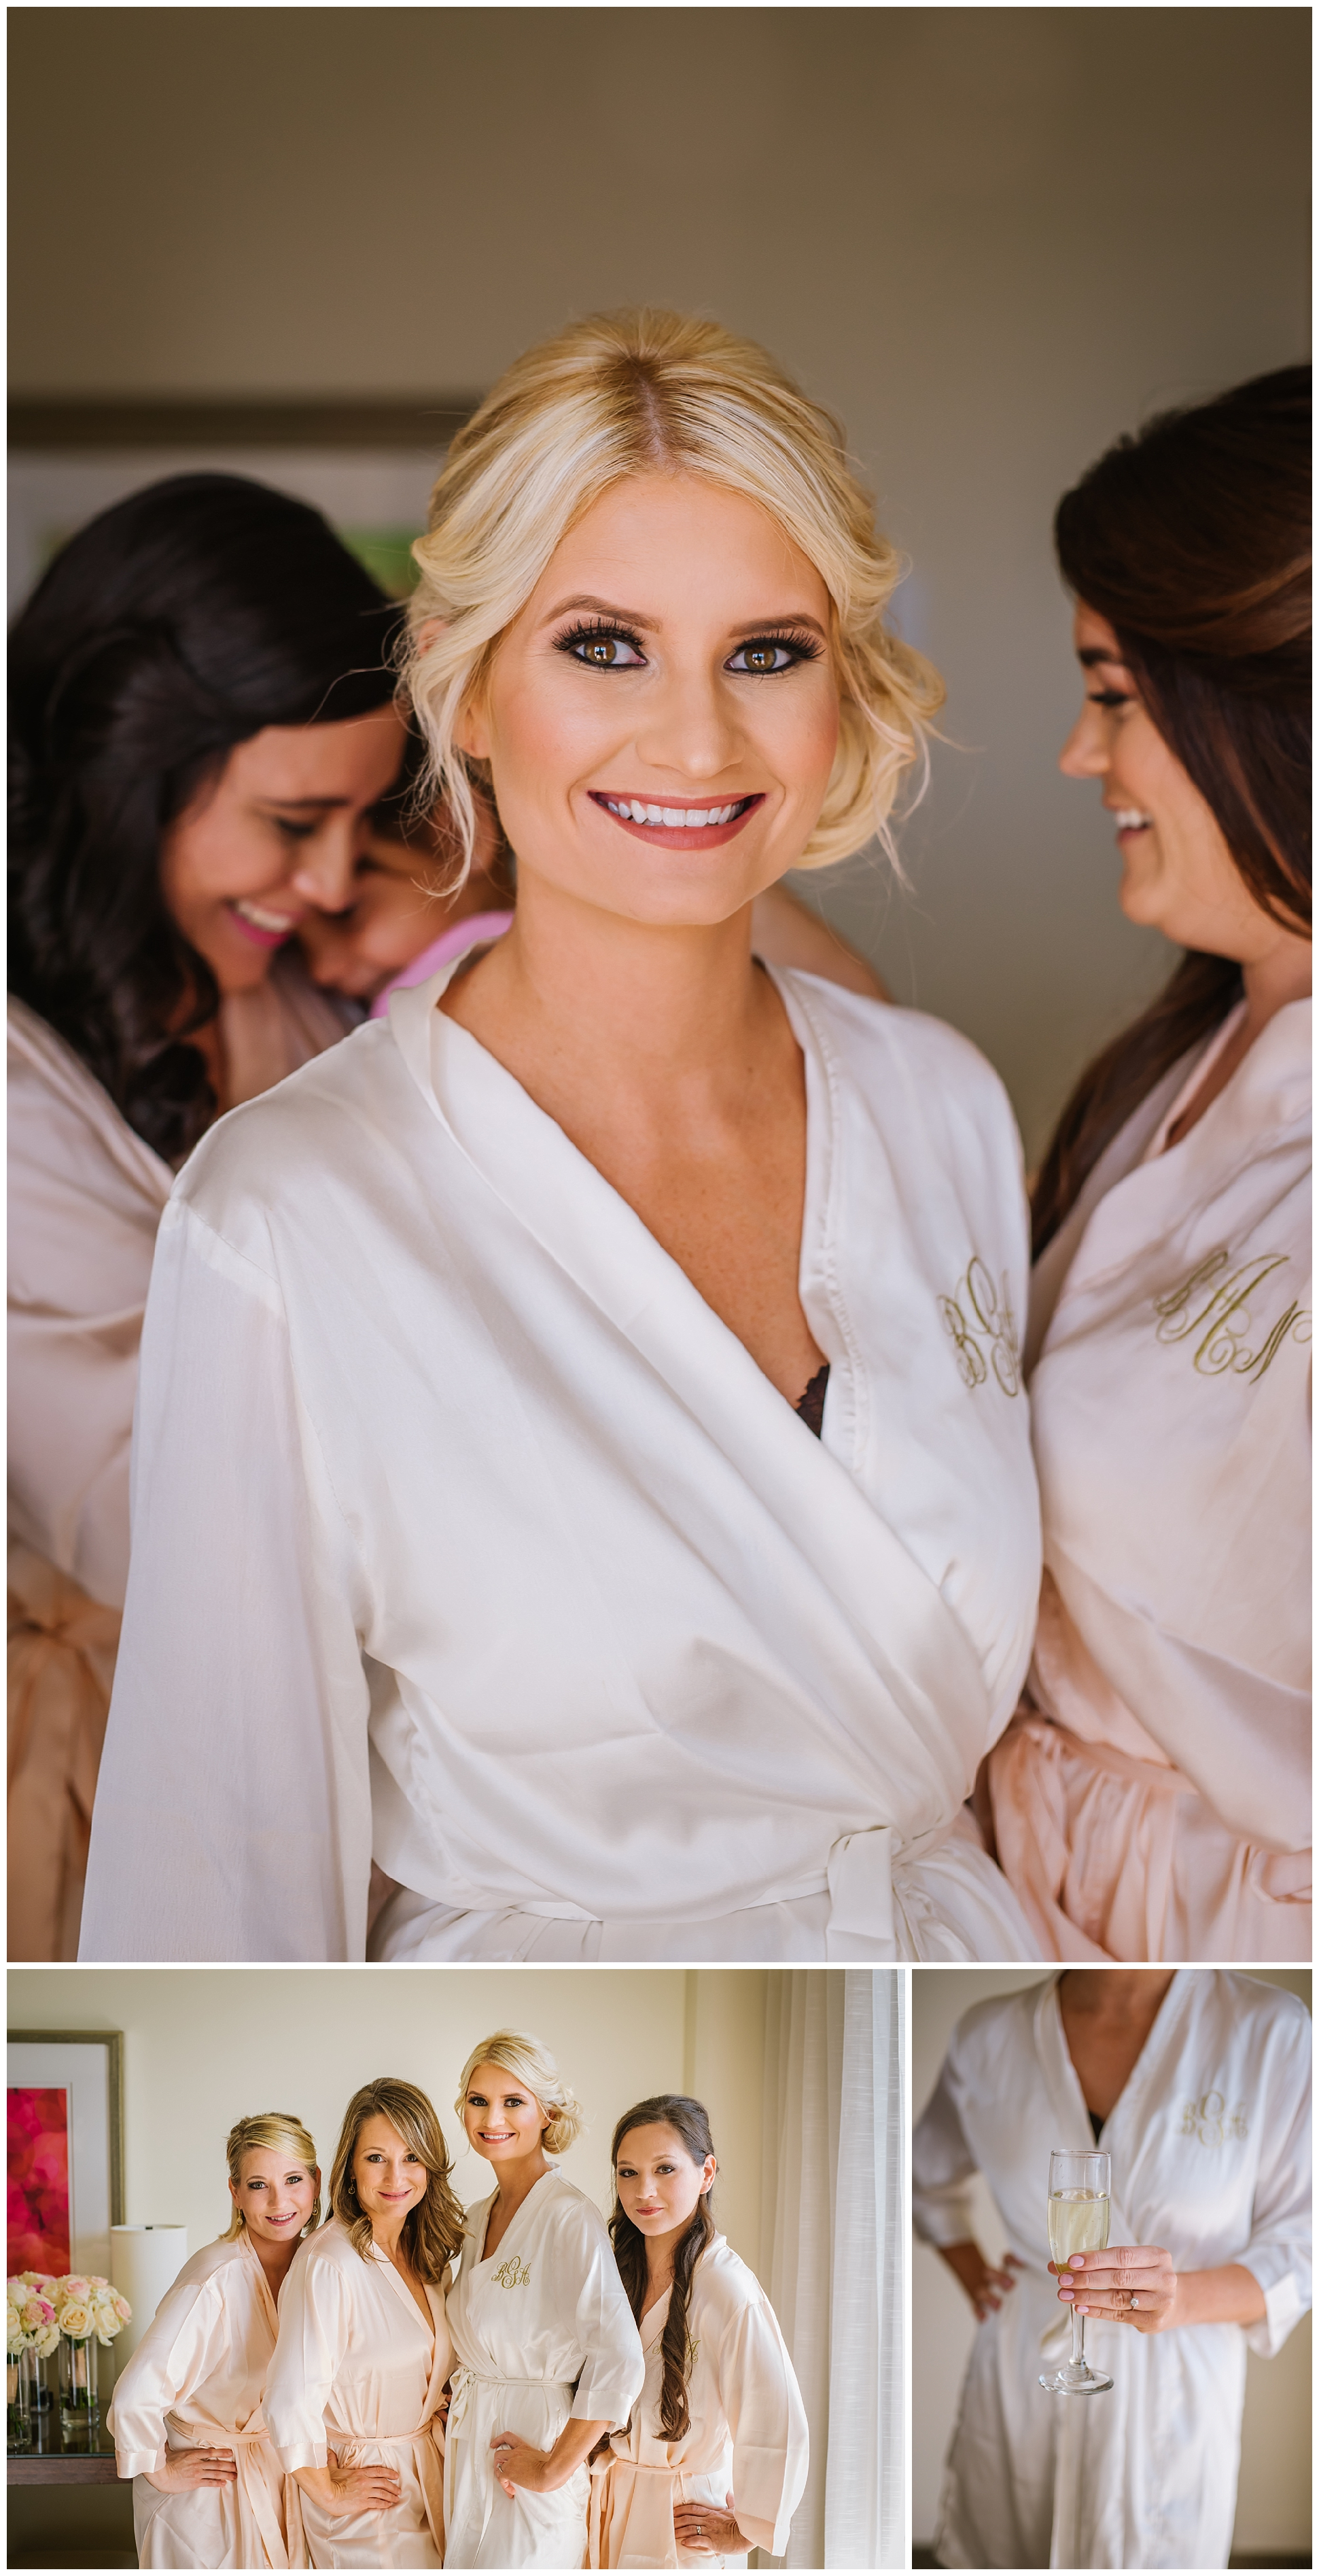 Sarasota-wedding-photographer-hyatt-regency-blush_0012.jpg